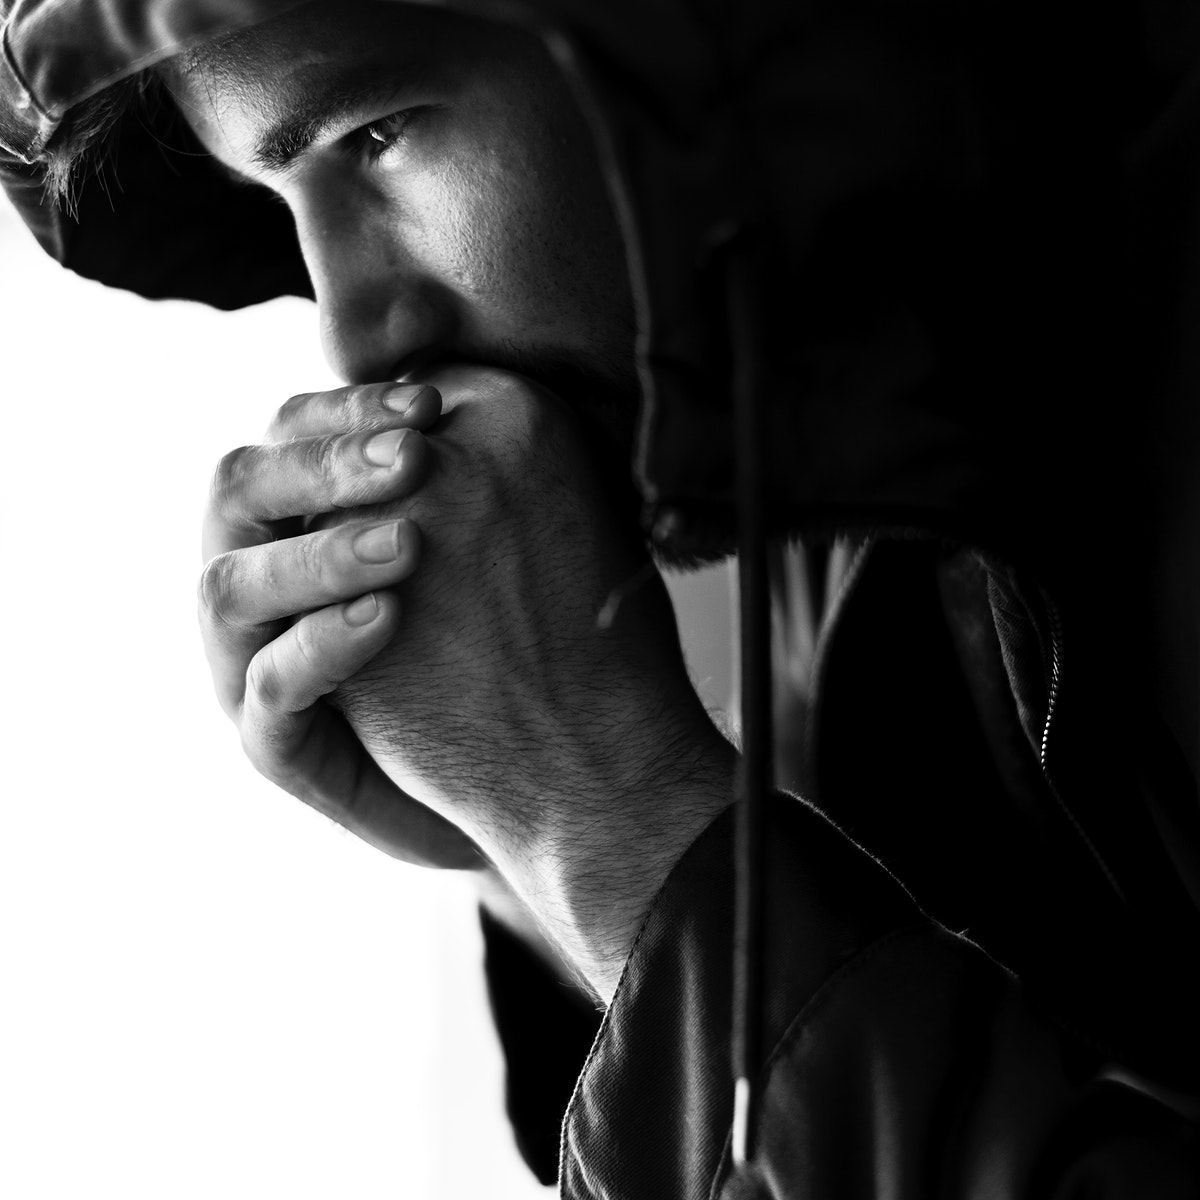 Closeup of homeless sitting thoughtful